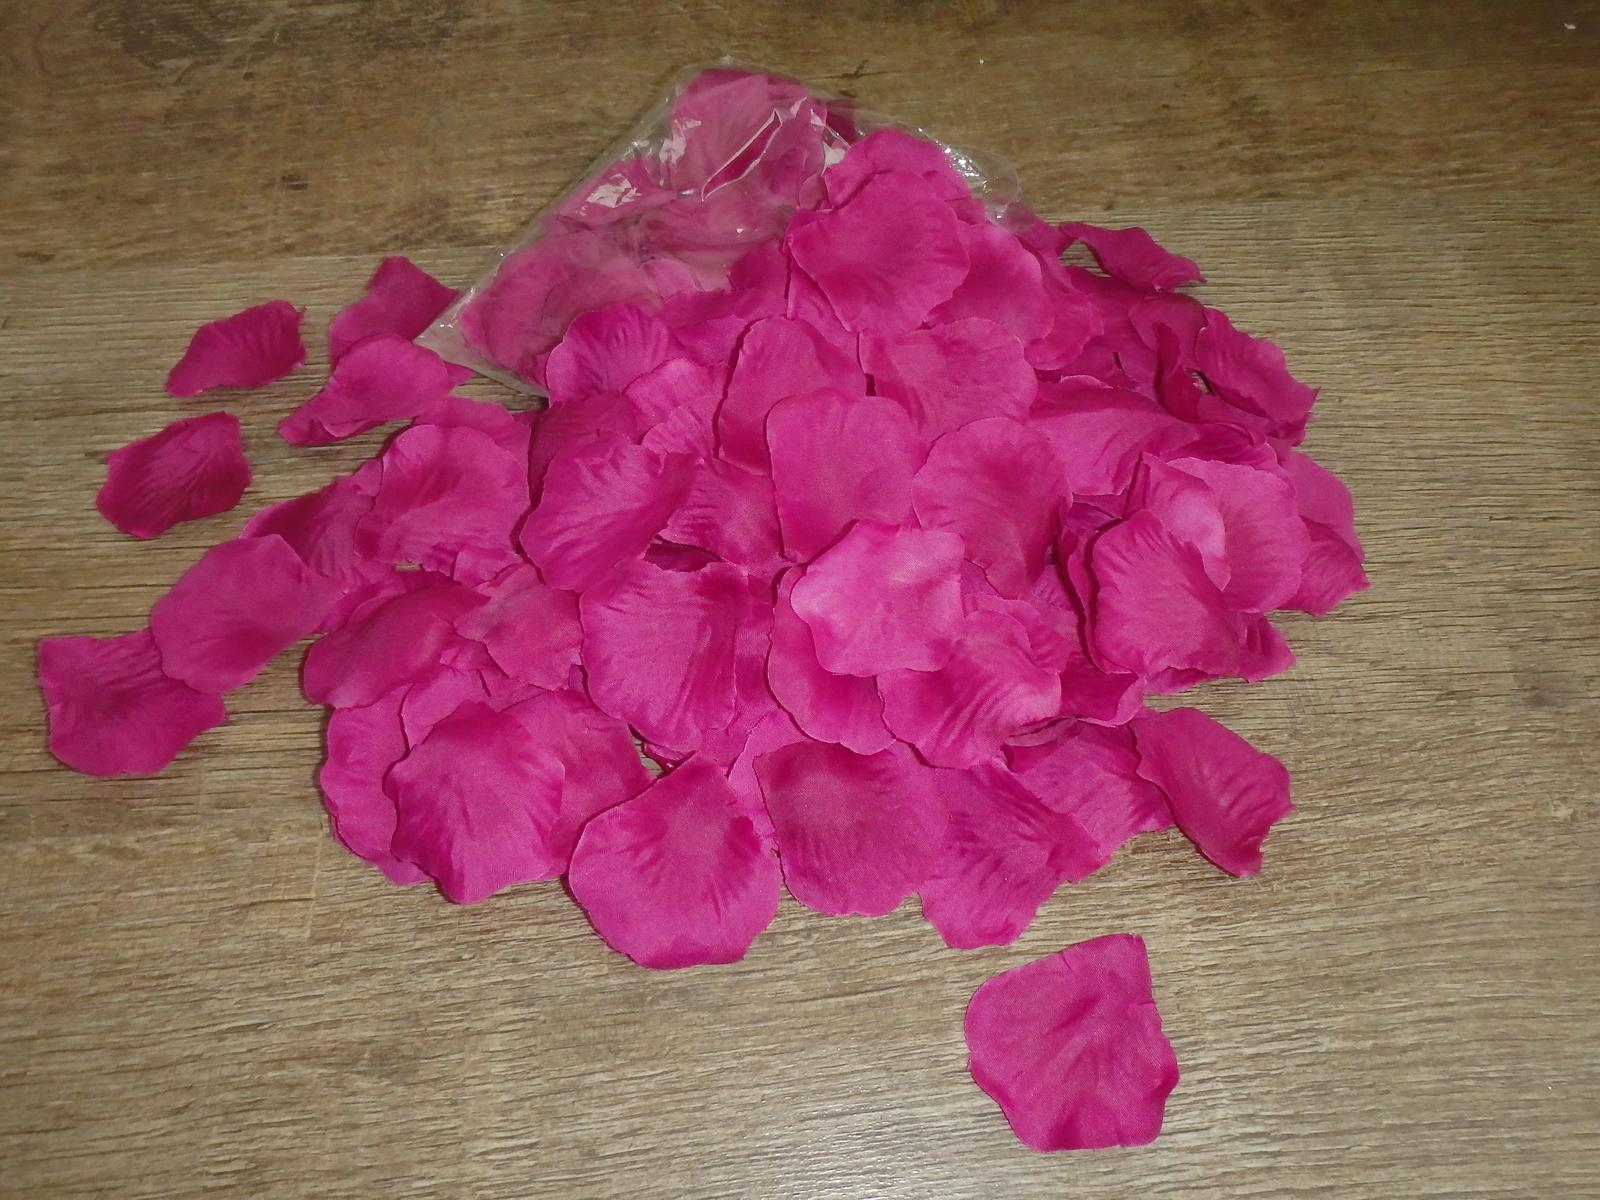 lupene ruží - Obrázok č. 1